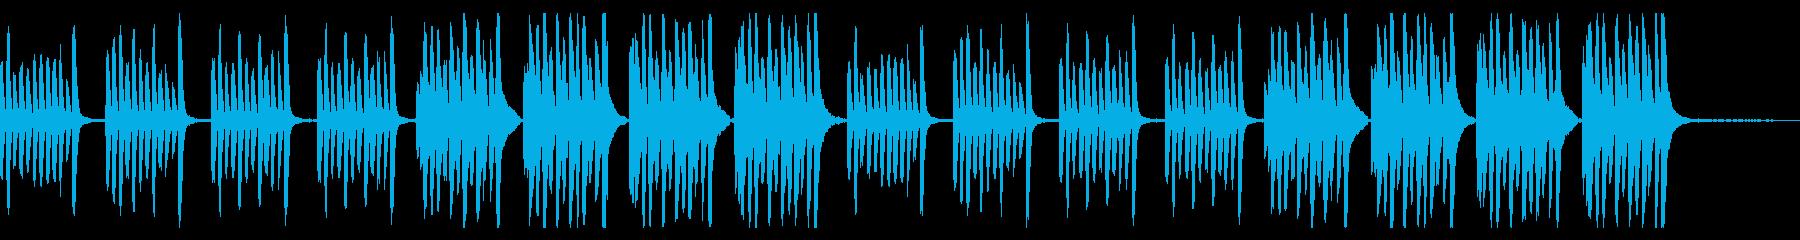 【youtube】ピアノの日常系BGMの再生済みの波形